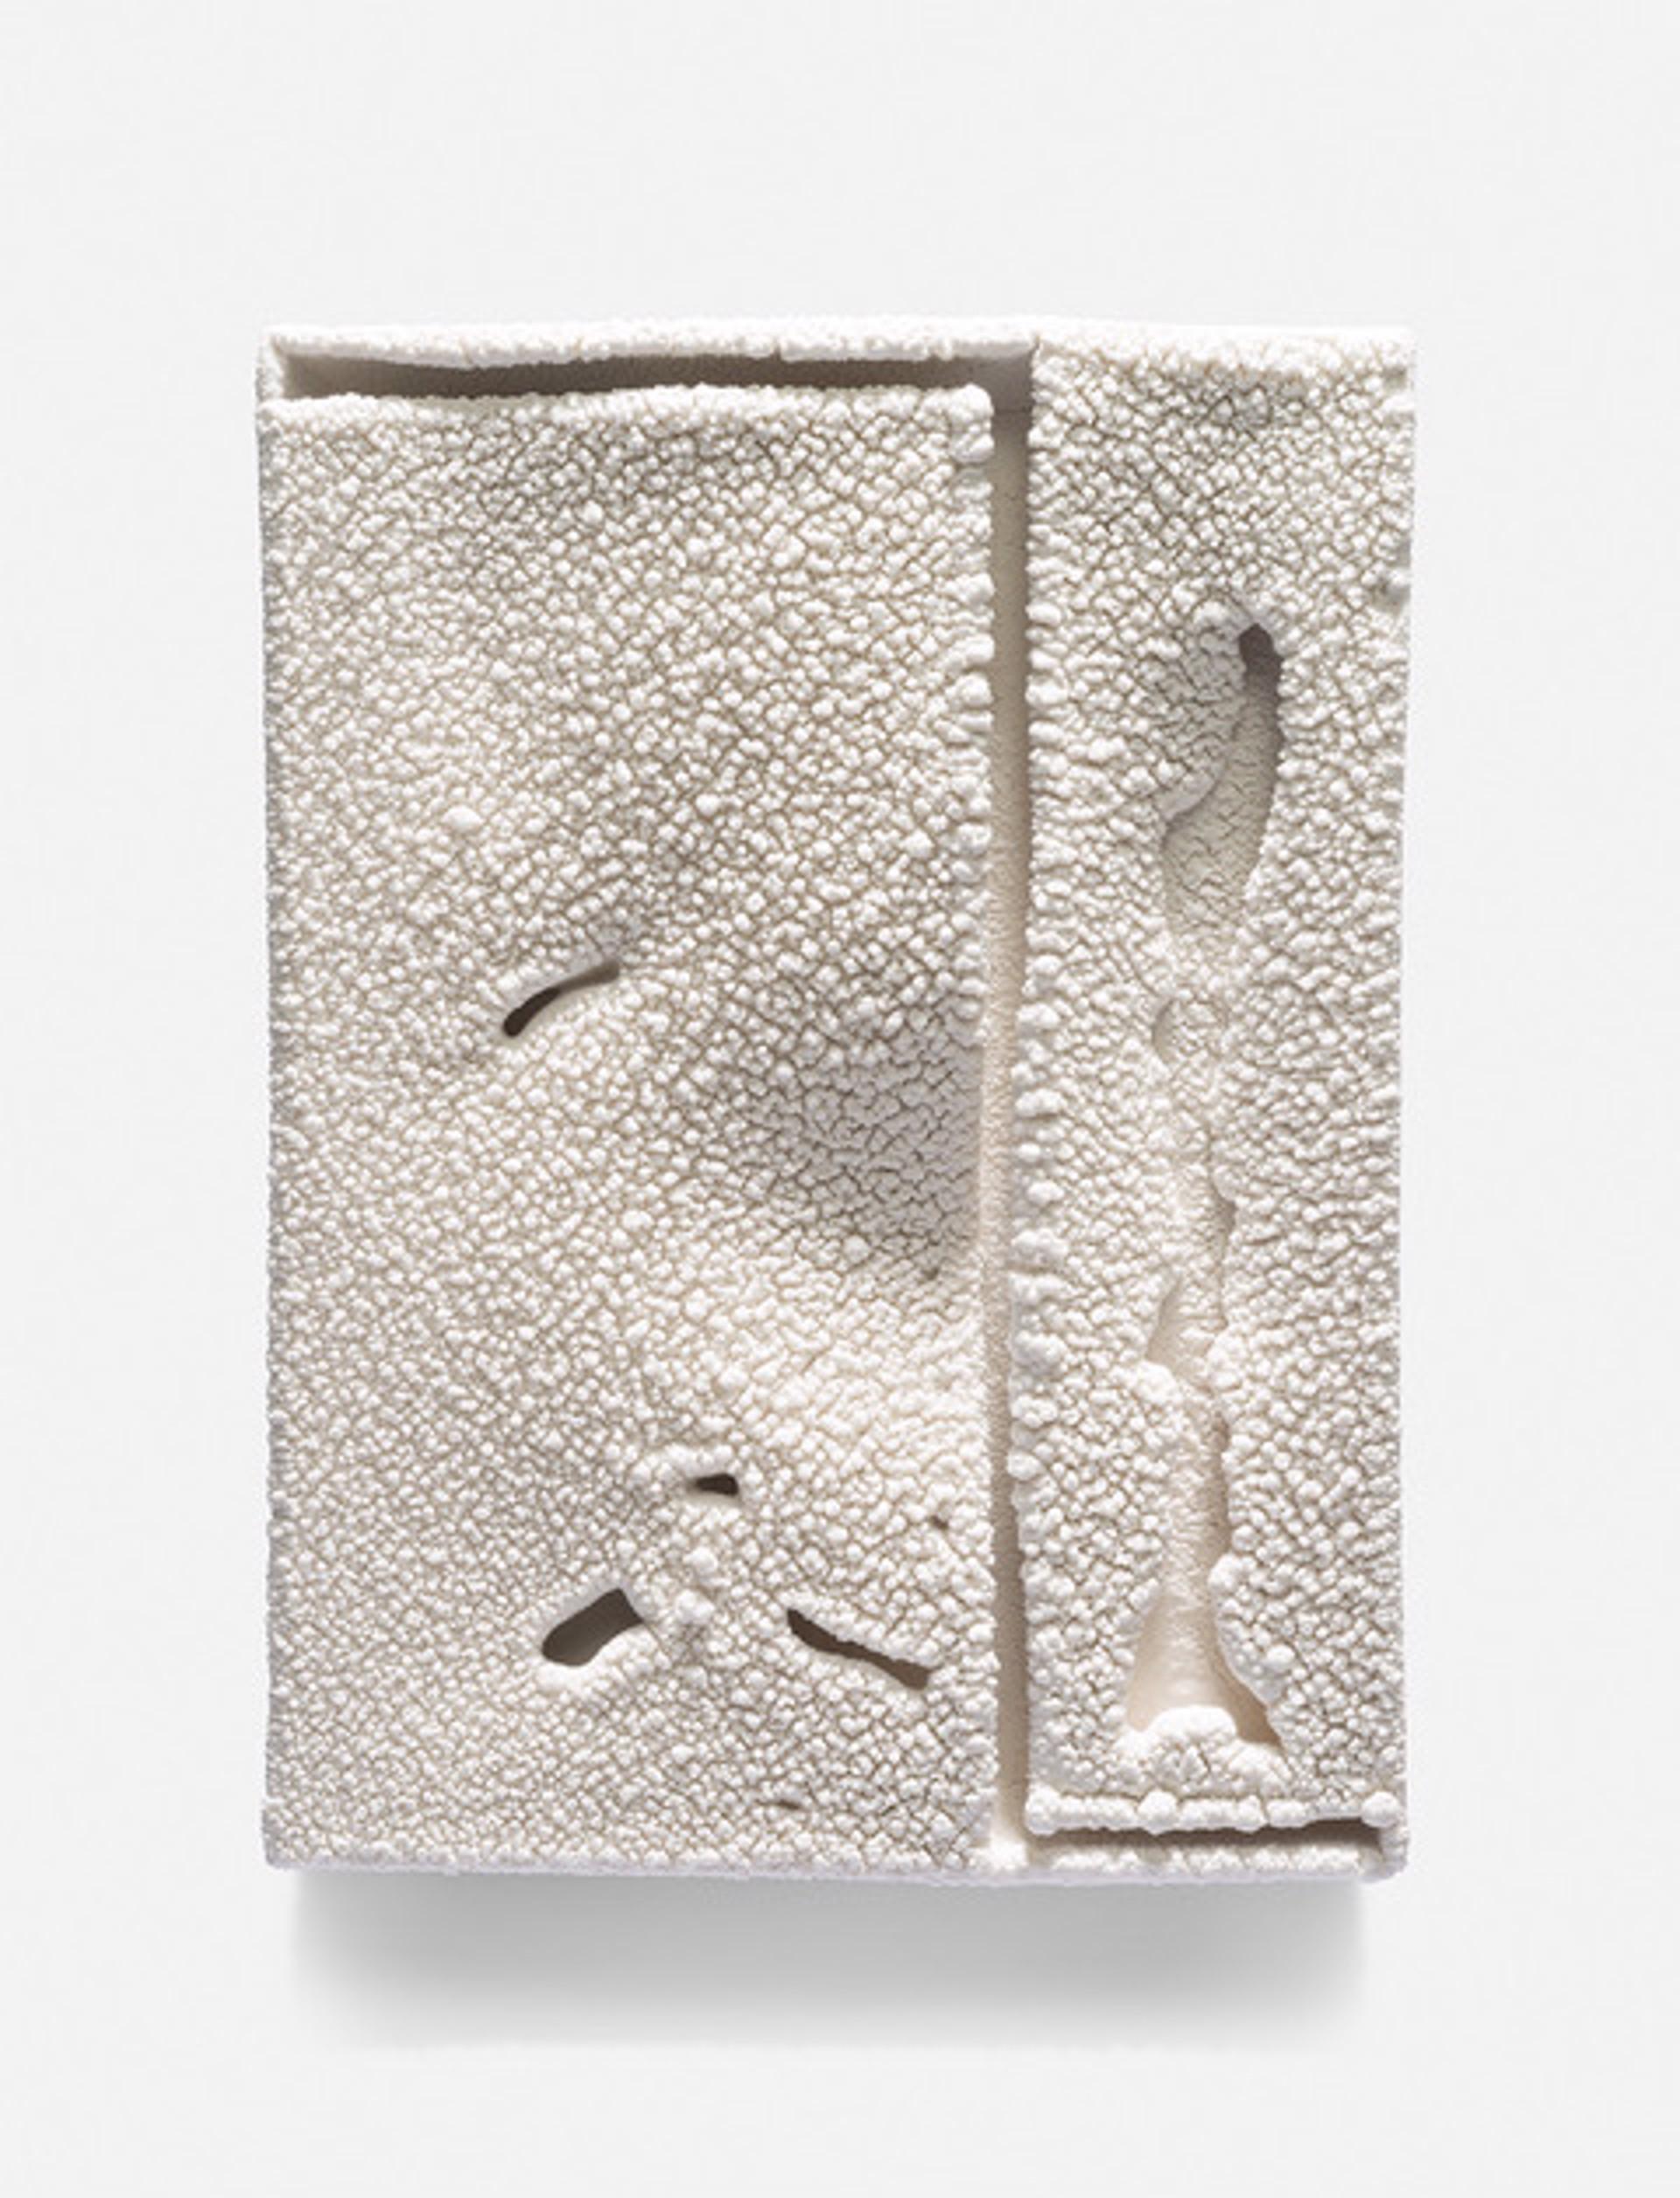 Parfleche (w206) by Cary Esser